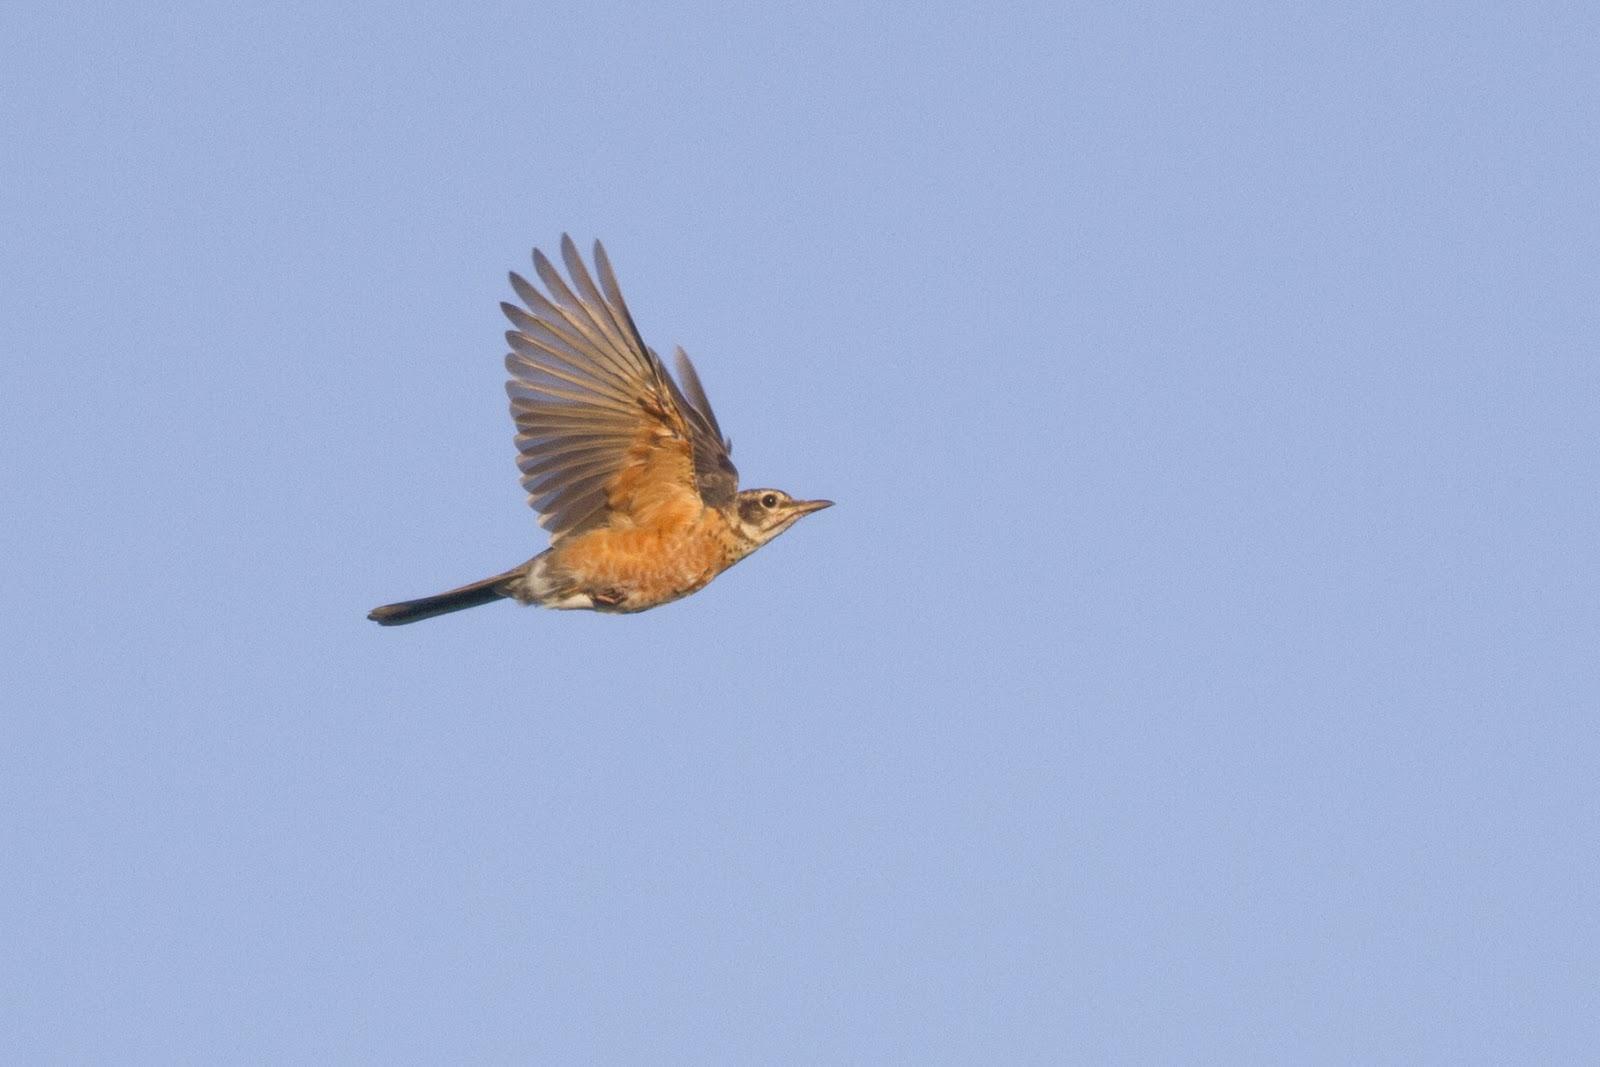 american robin bird flying - photo #12